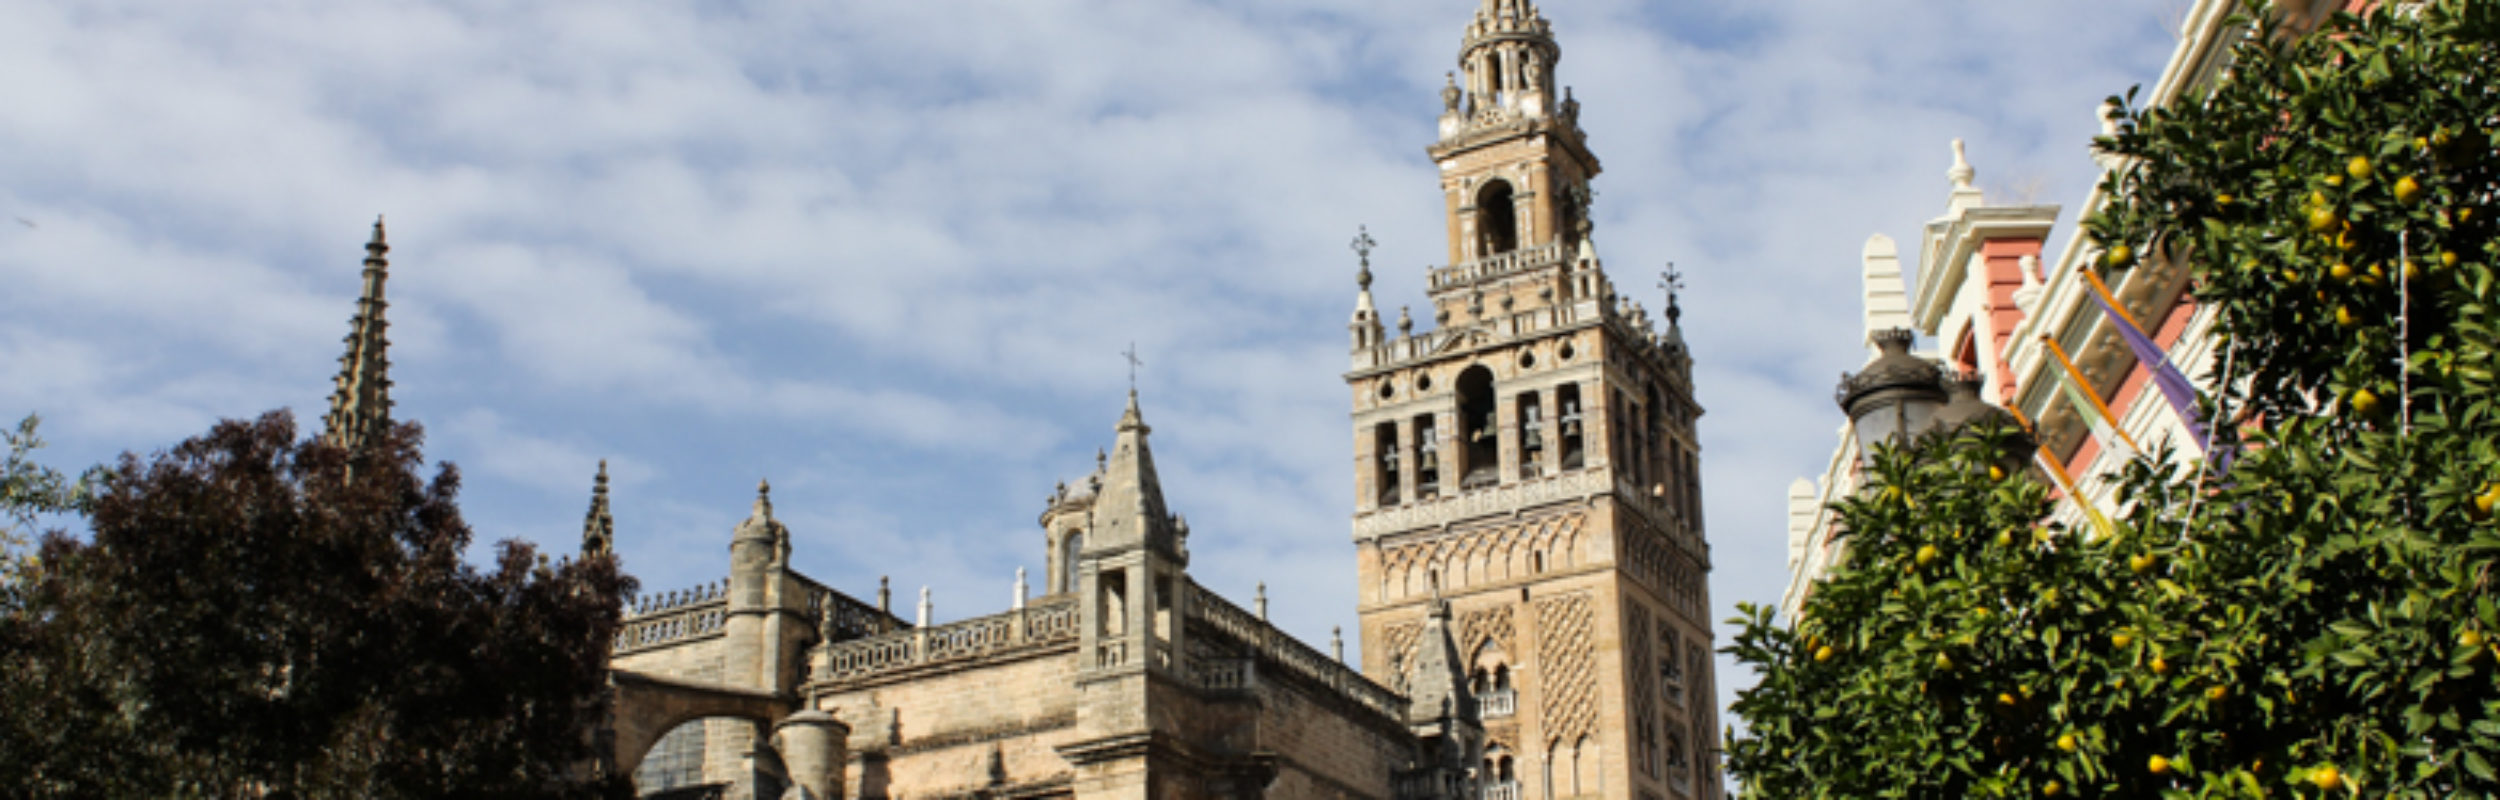 Road-trip en Andalousie #5 : Séville vue d'en haut depuis la Giralda !